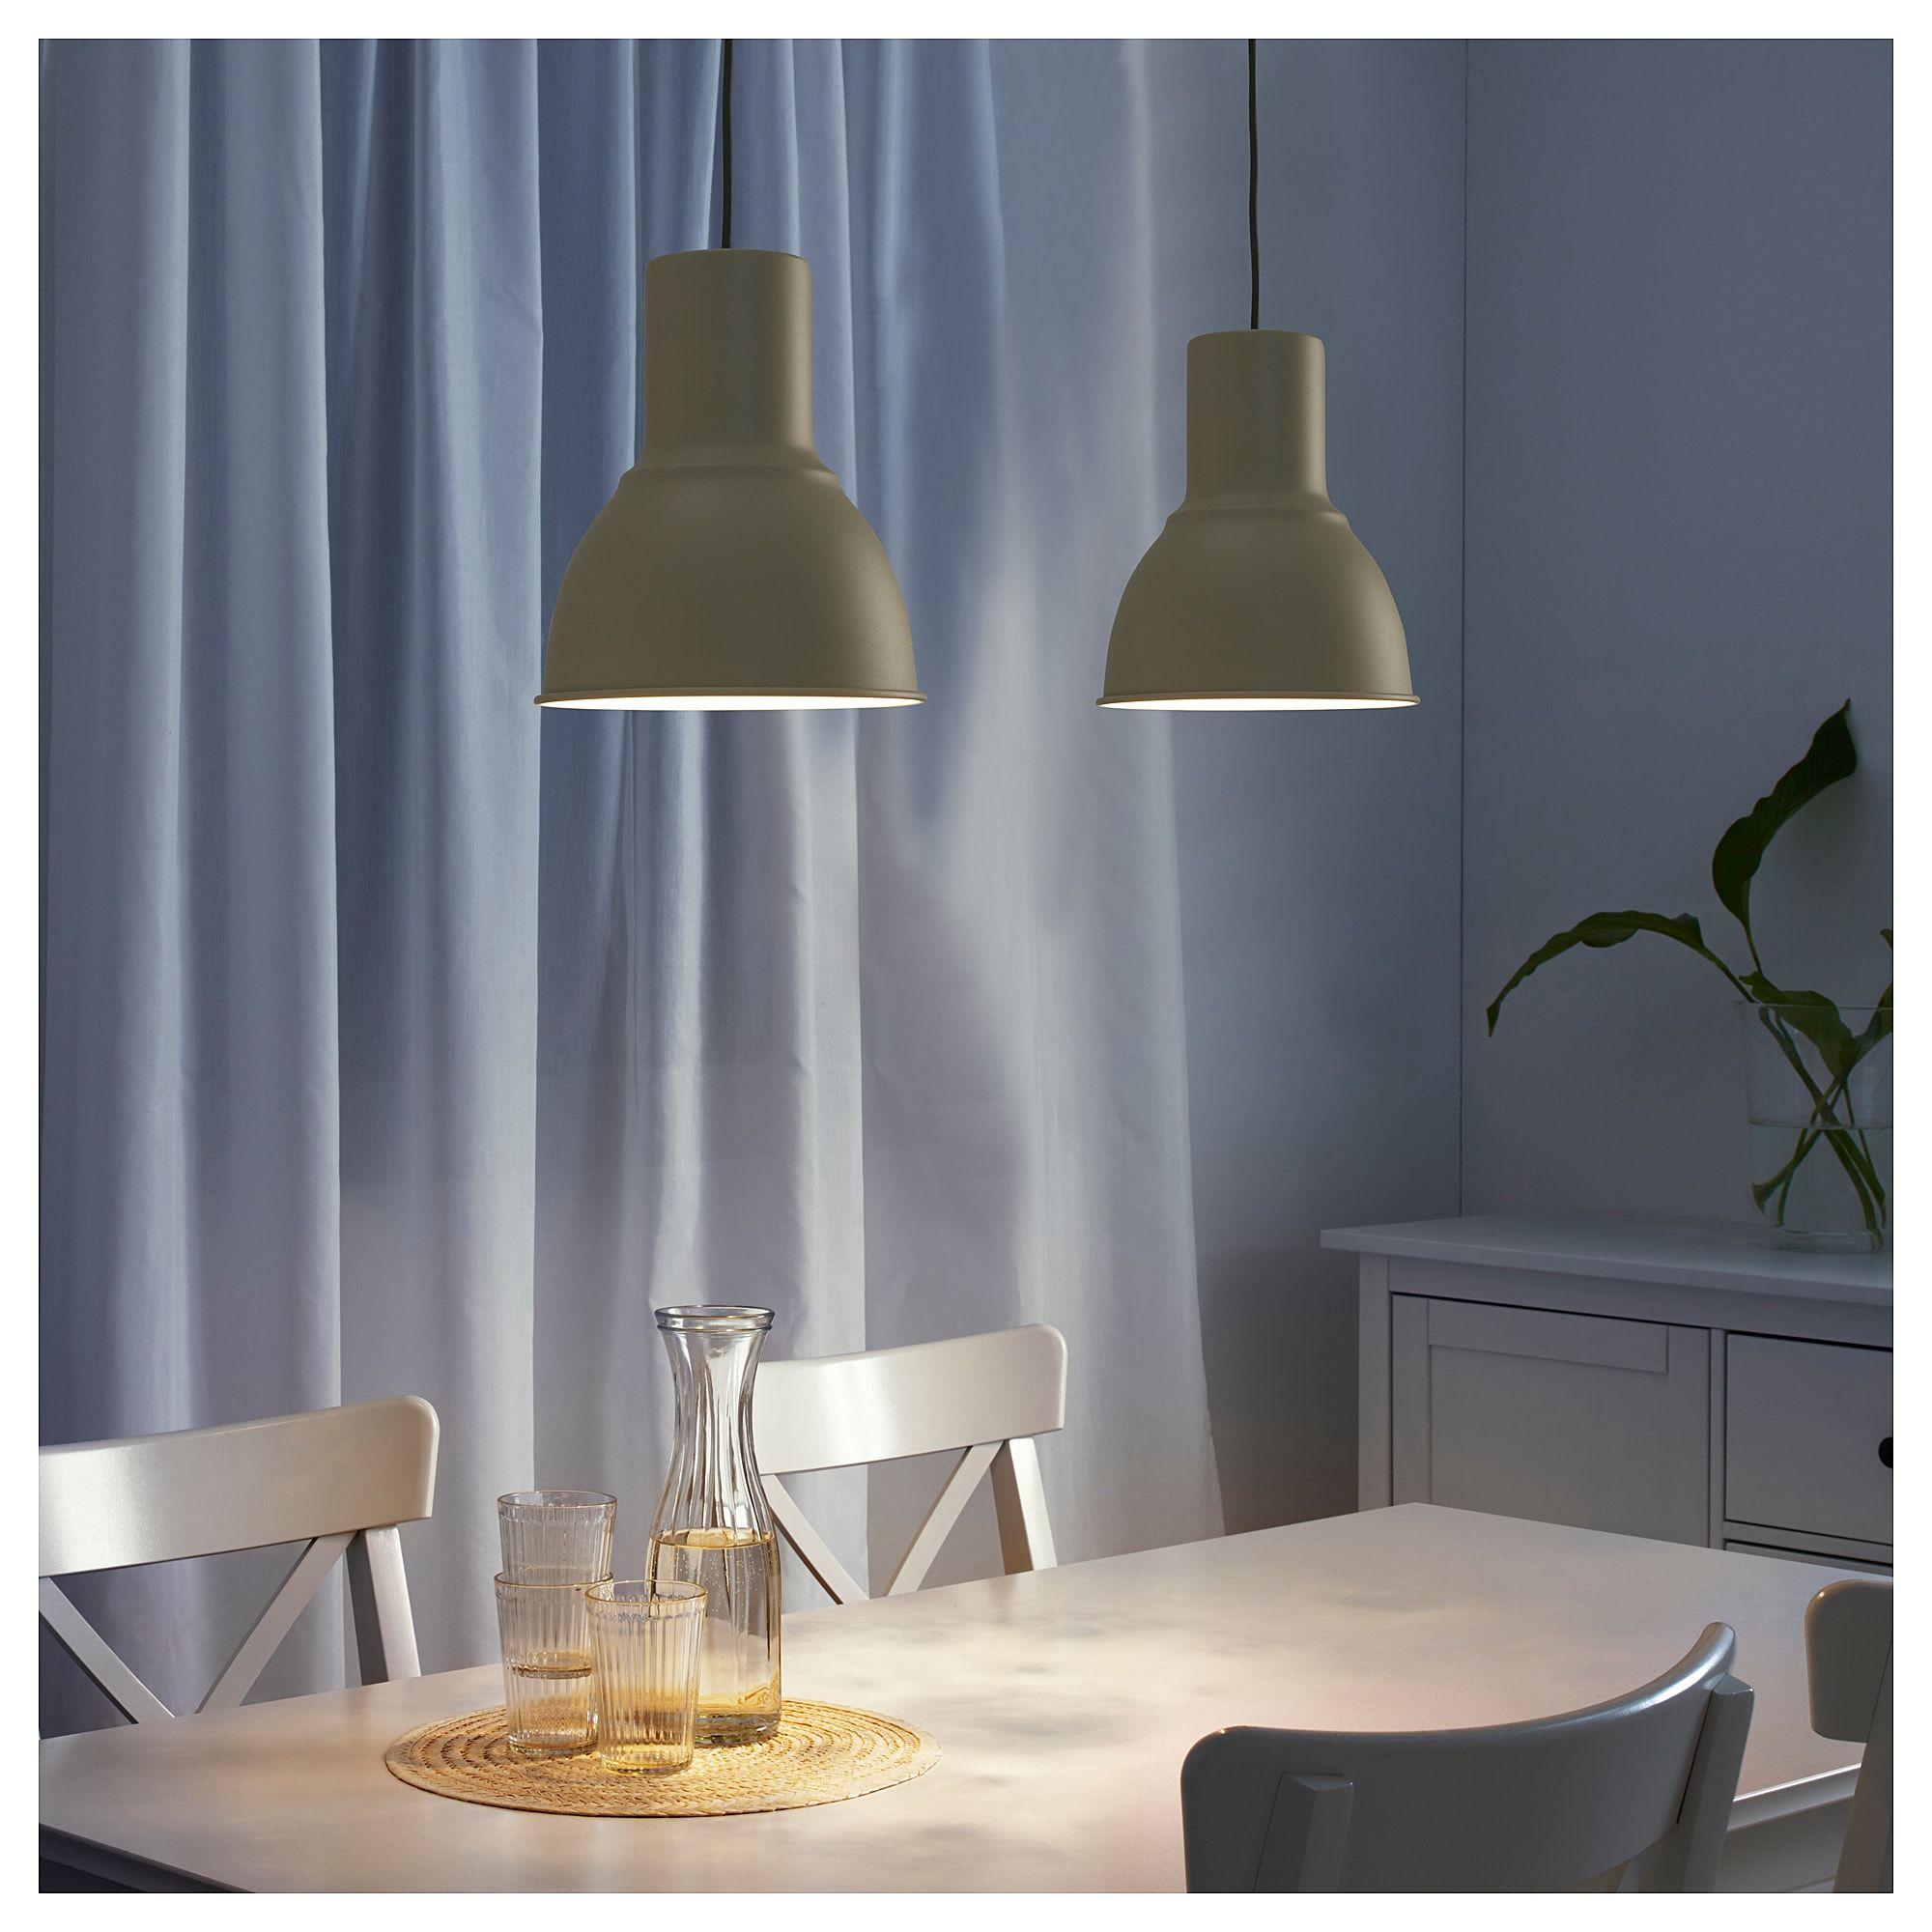 Ikea Hektar Pendant Lamp Beige In 2019 Living Room